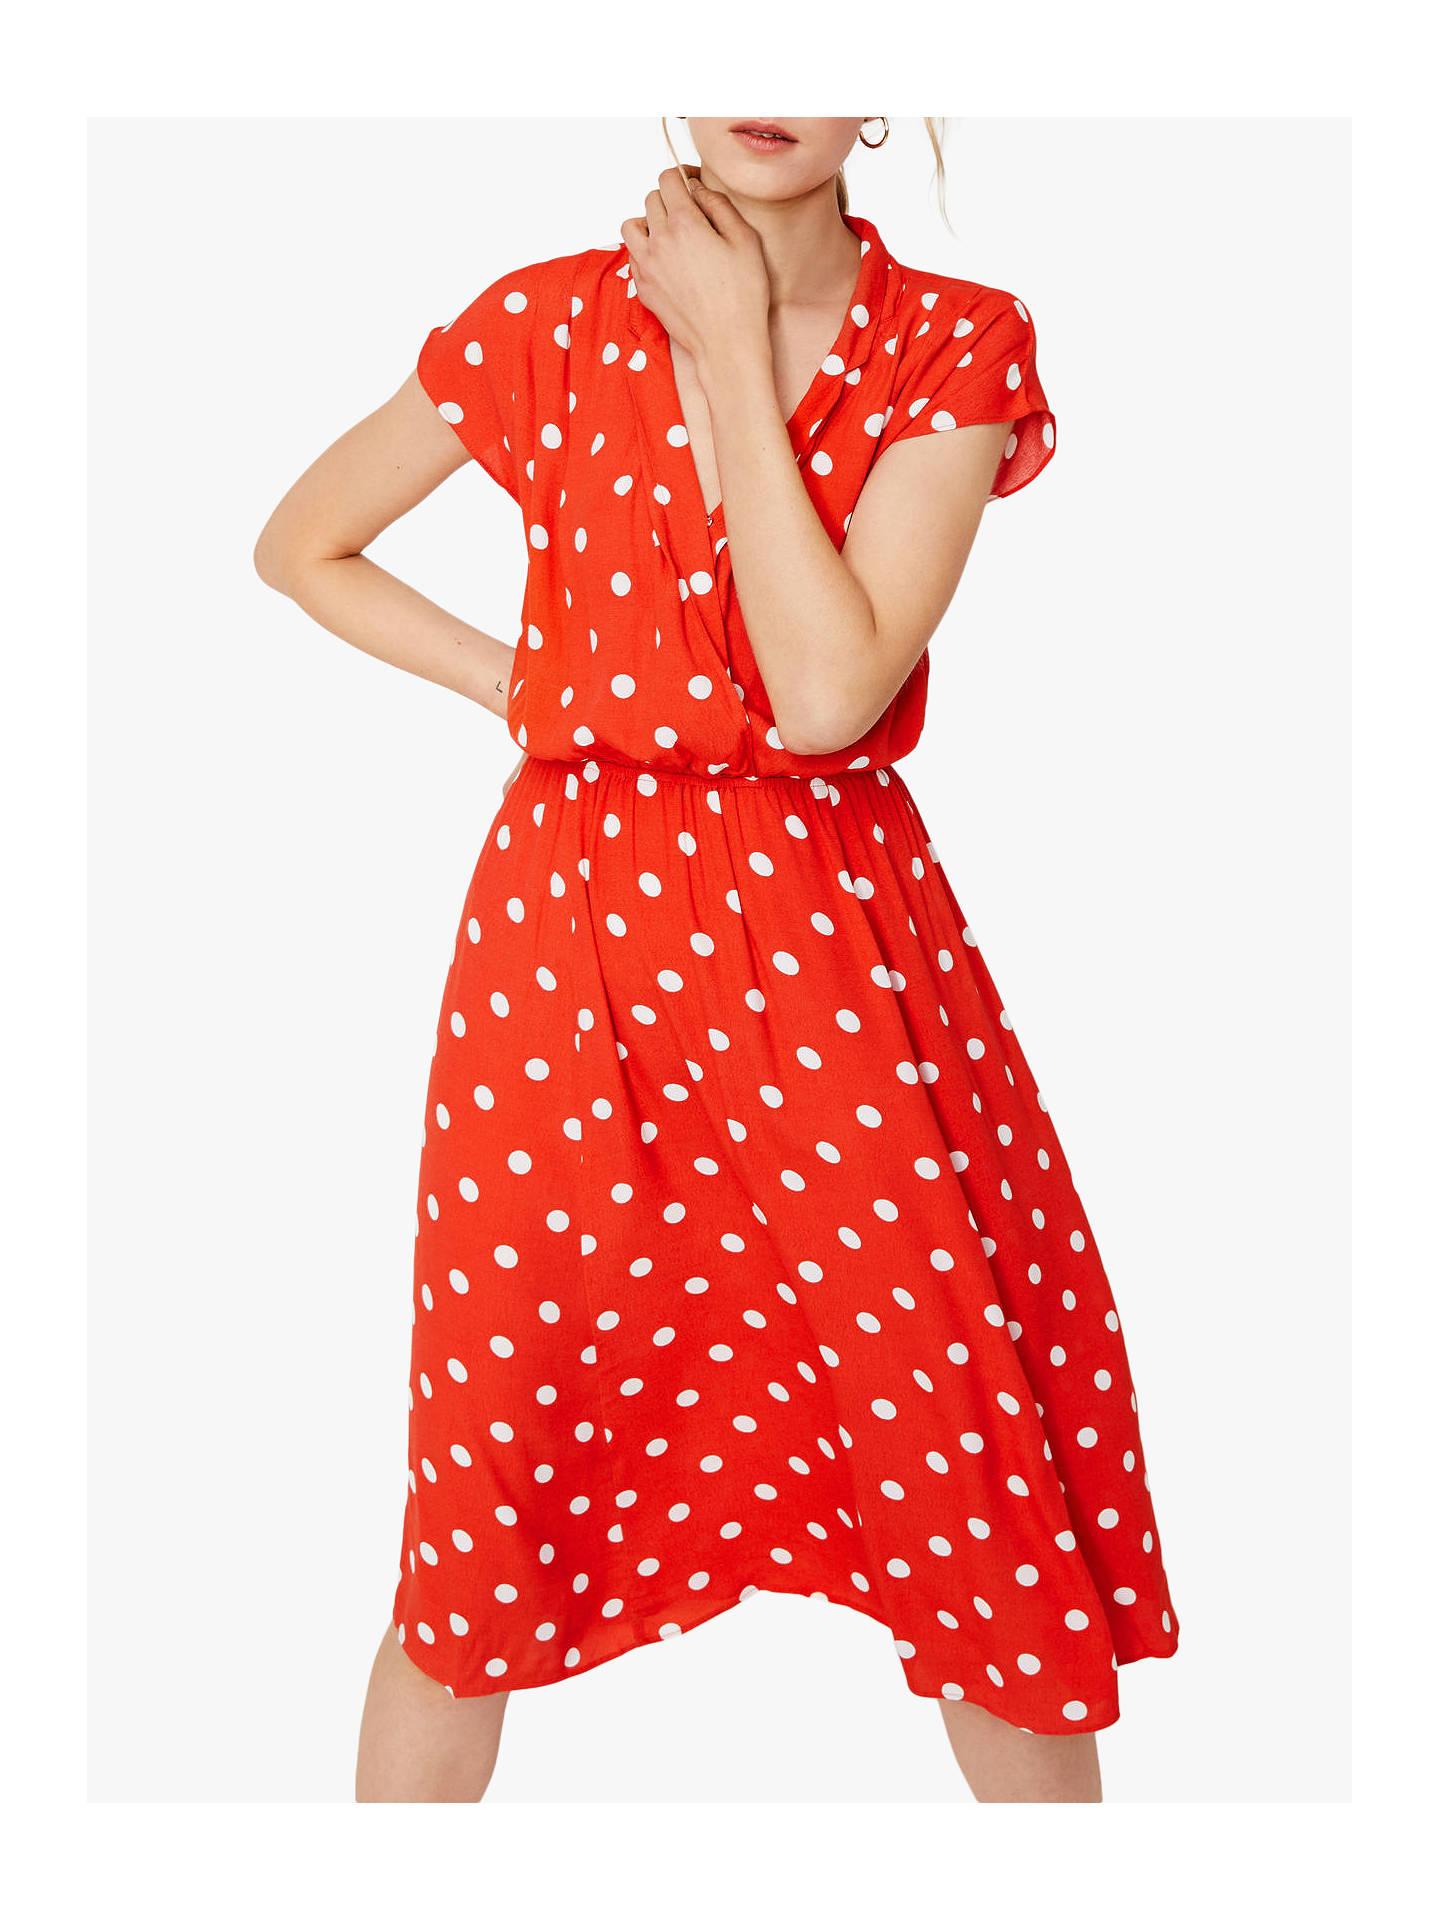 cdb74e519 Buy Warehouse Polka Dot Shirt Dress, Coral, 12 Online at johnlewis.com ...